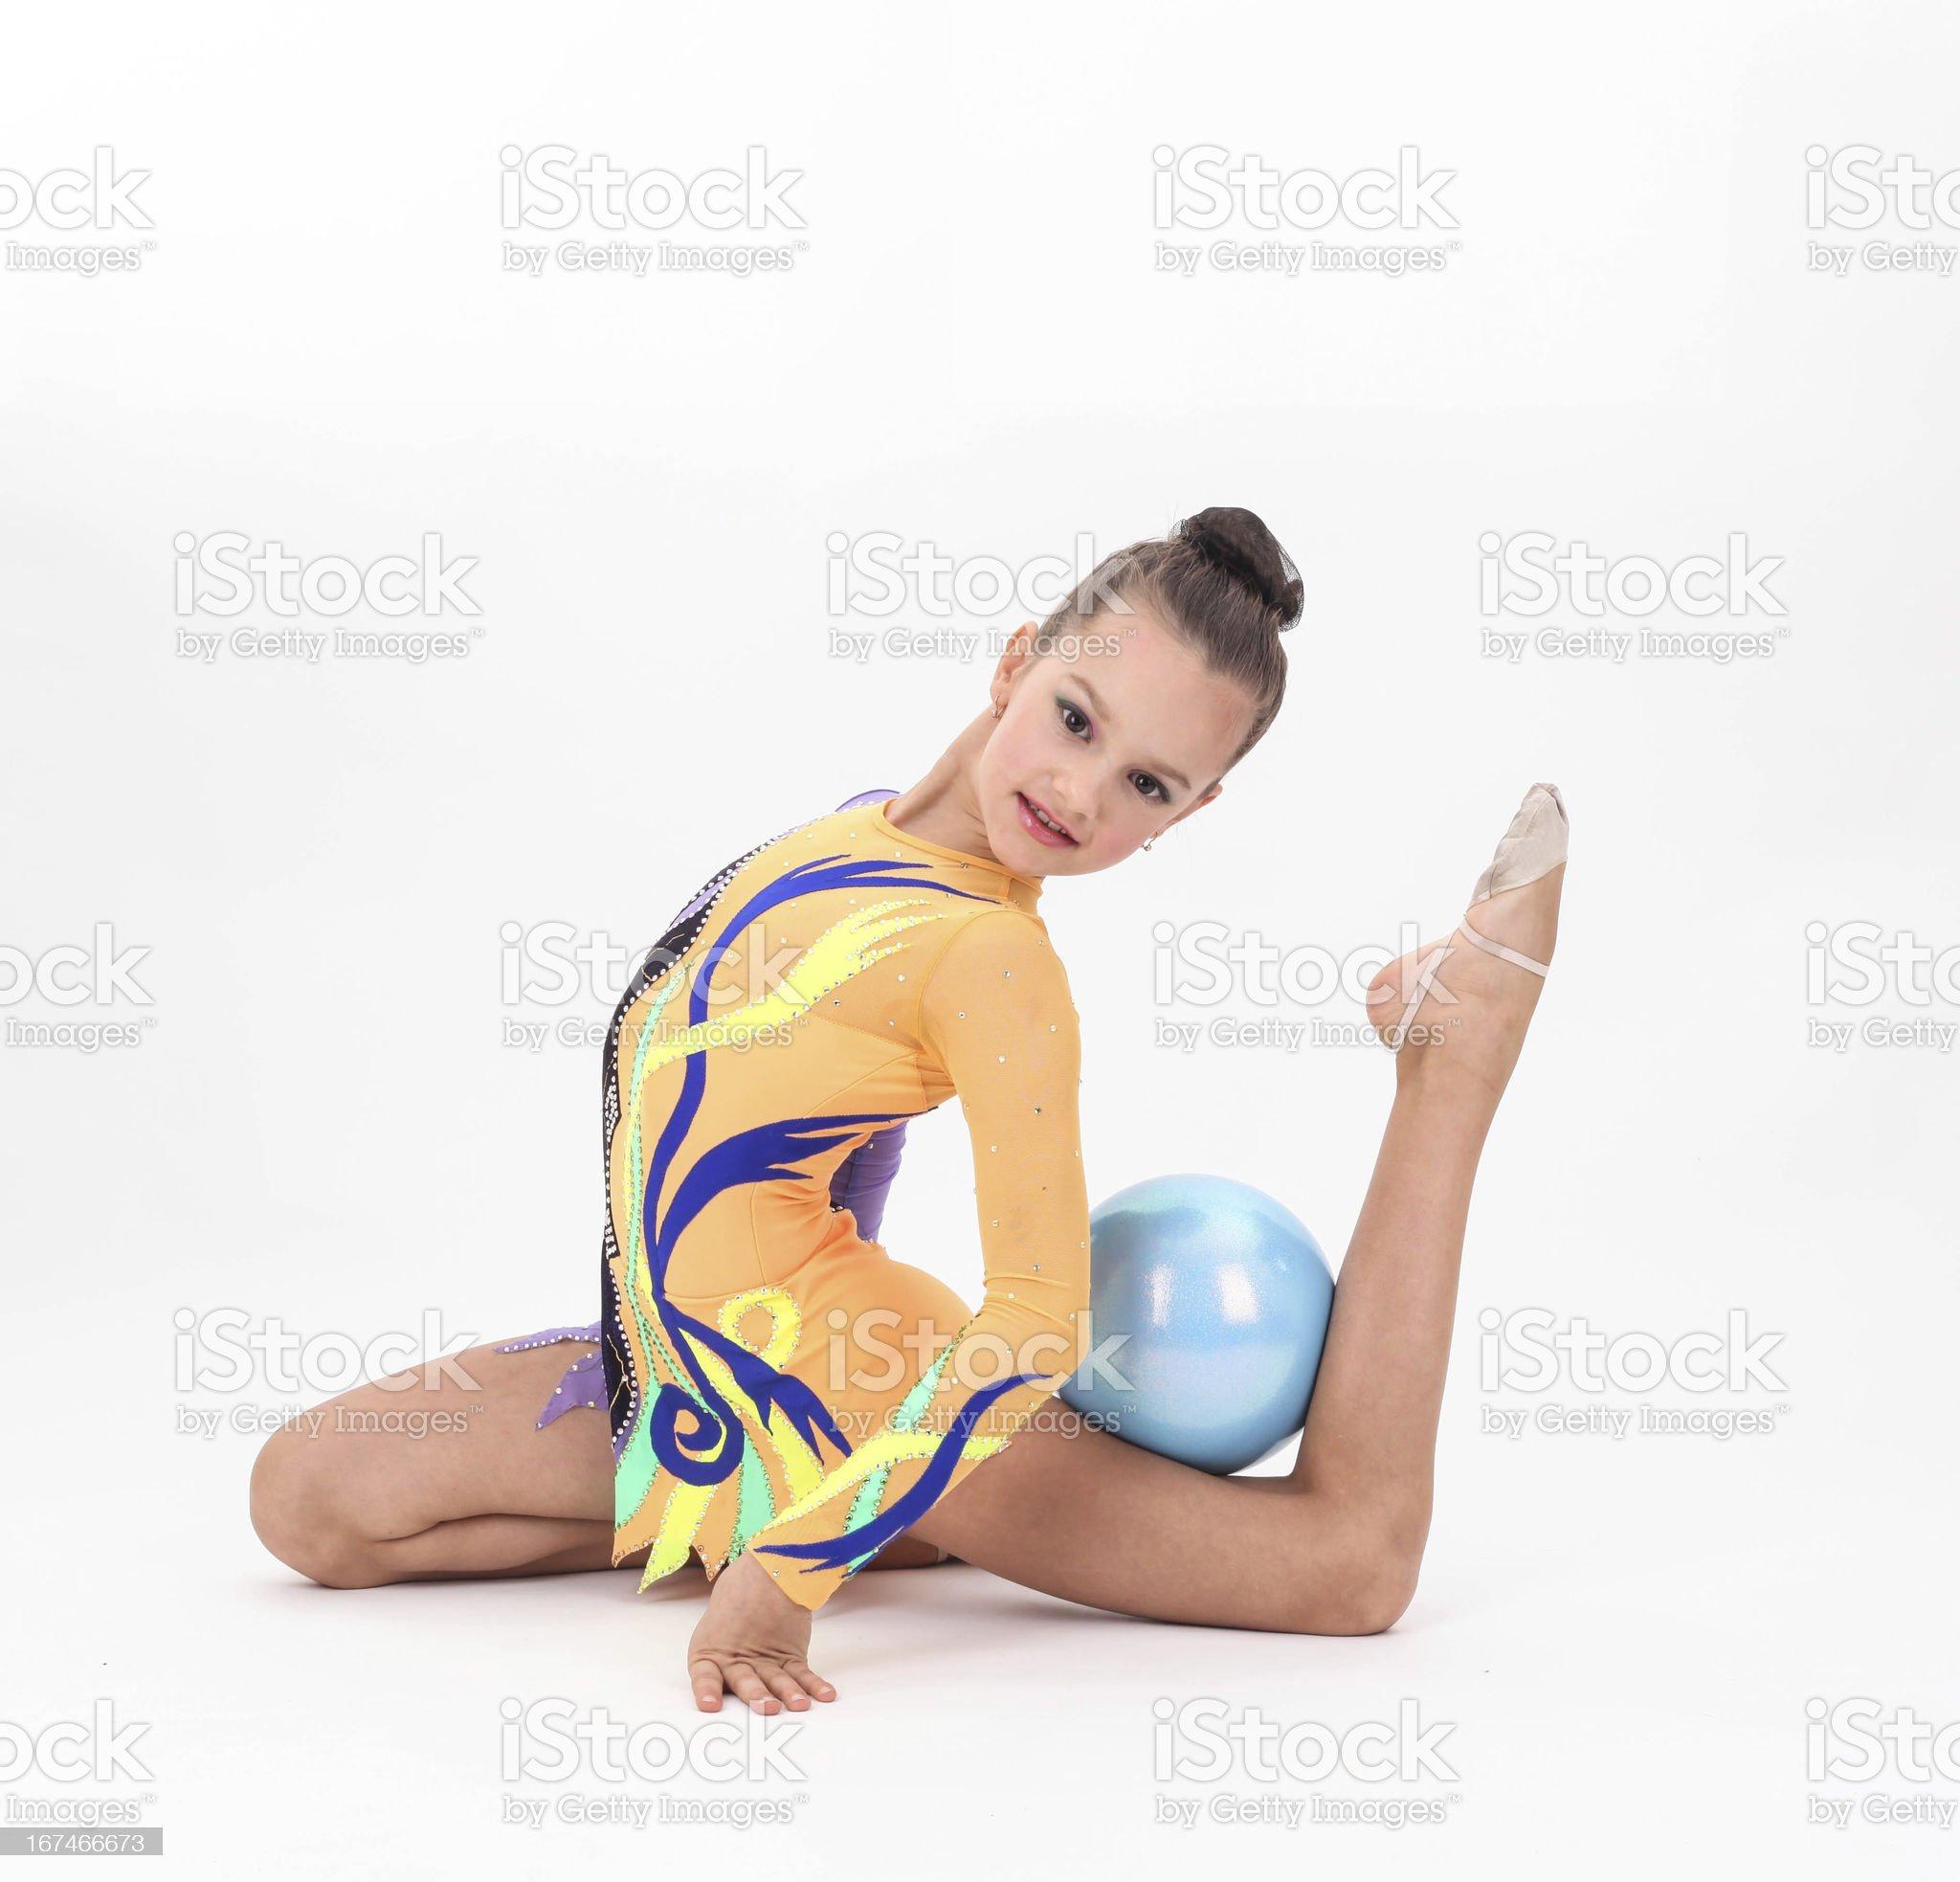 Beautiful flexible girl gymnast royalty-free stock photo